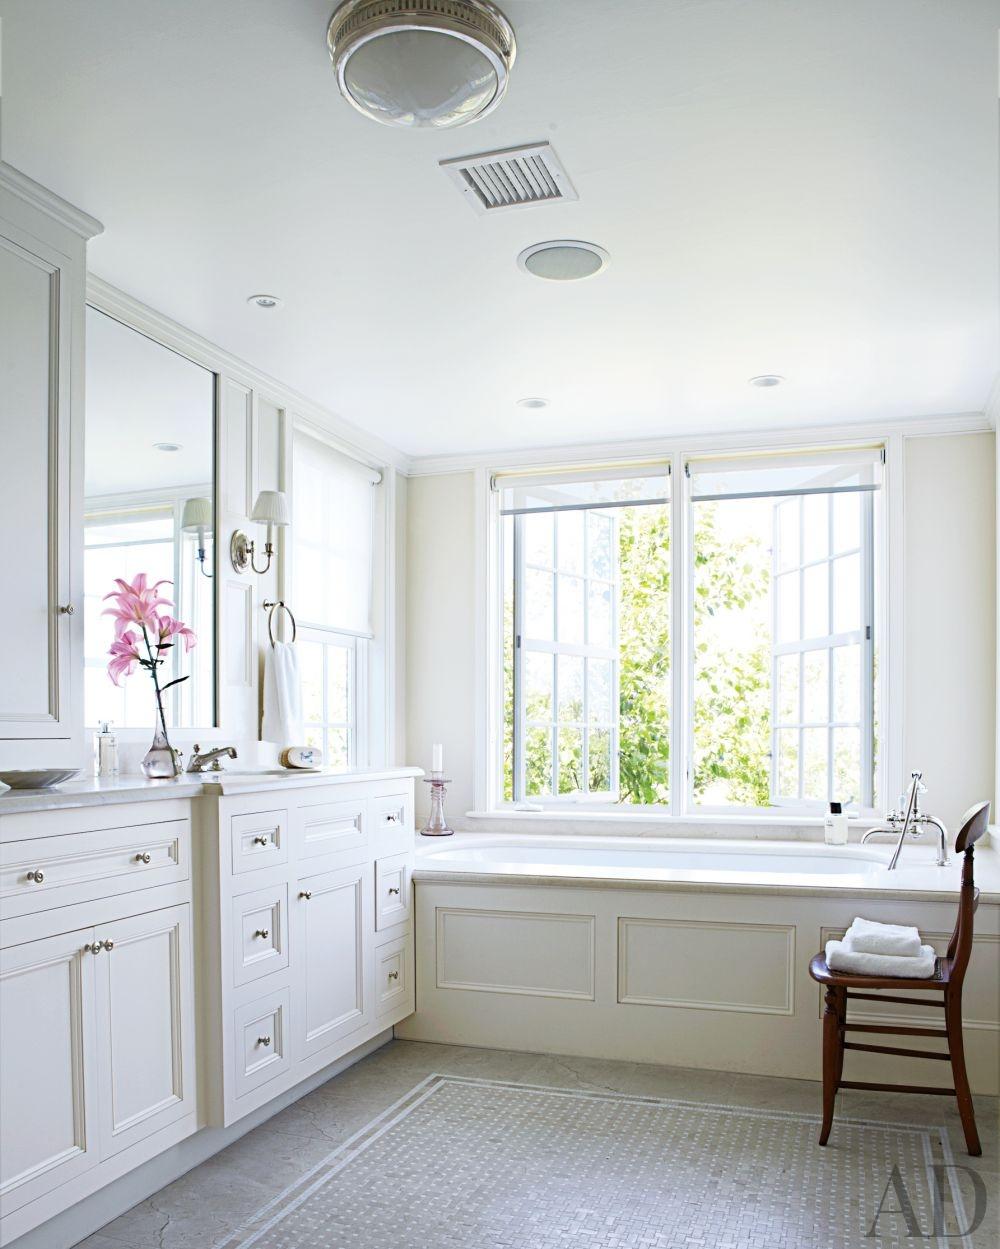 Small Traditional Bathroom